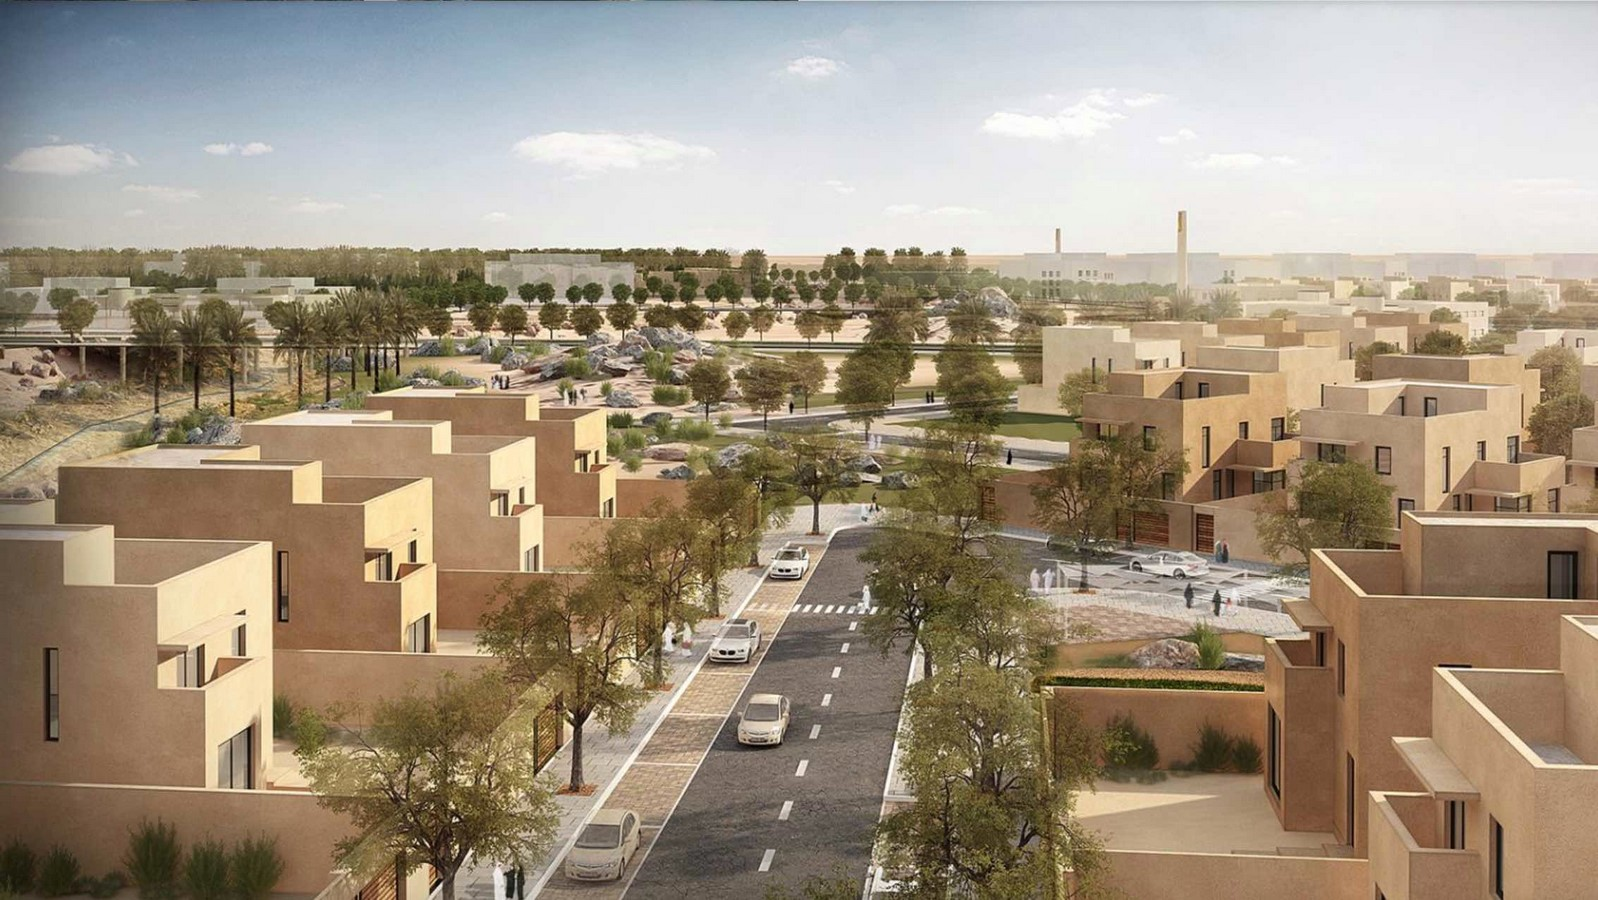 MINISTRY OF HOUSING, TAIF, SAUDI ARABIA - Sheet3